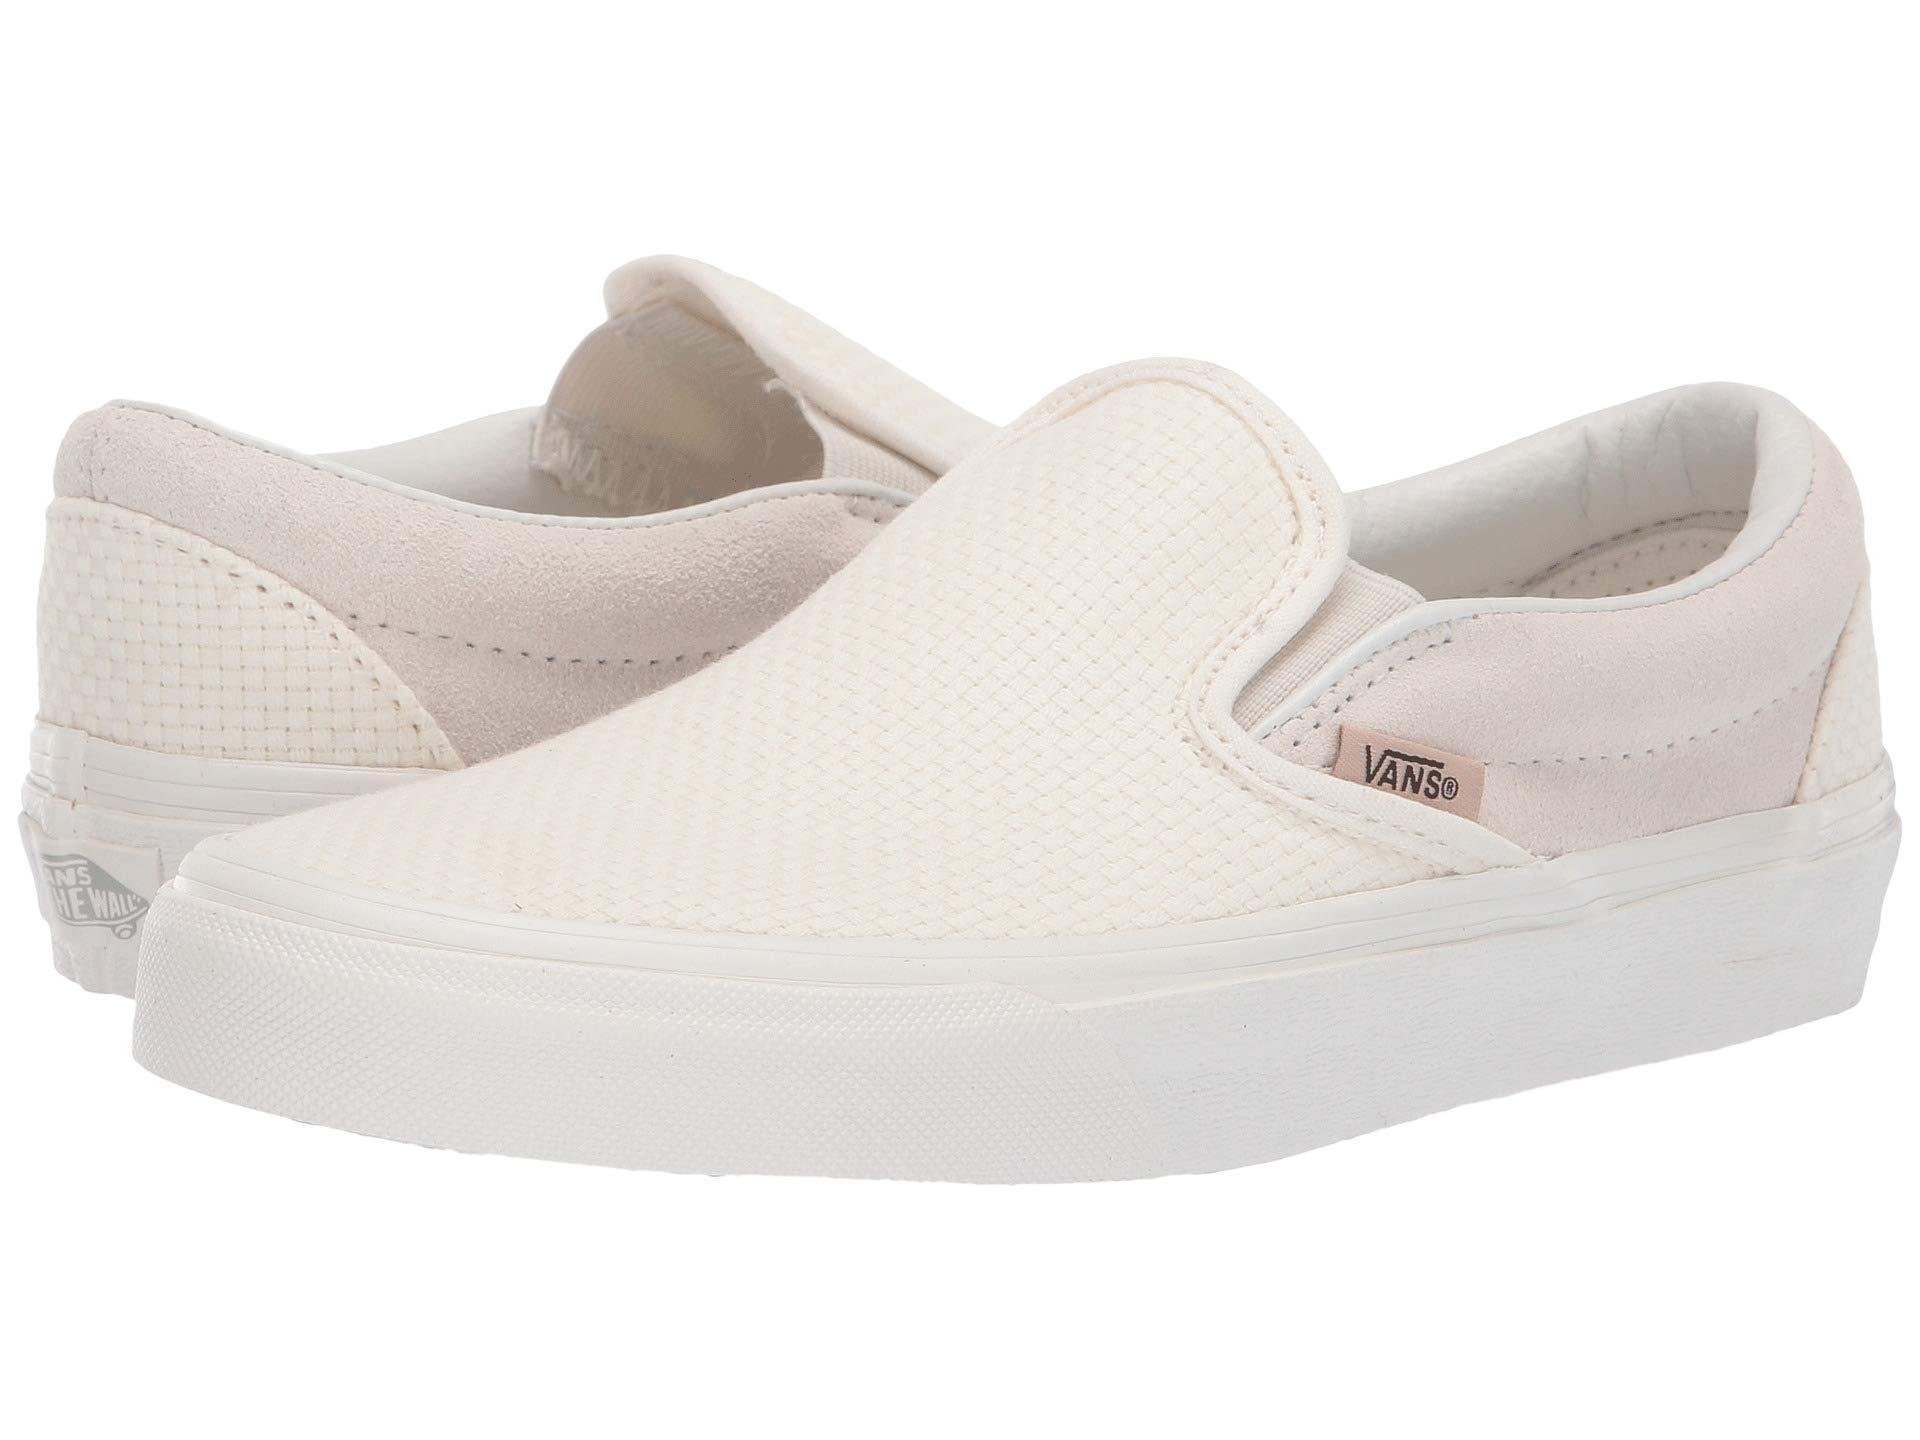 fcc1b77b7db7 Vans. Women s Classic Slip-ontm ((embossed Suede) Sequoia true White) Skate  Shoes